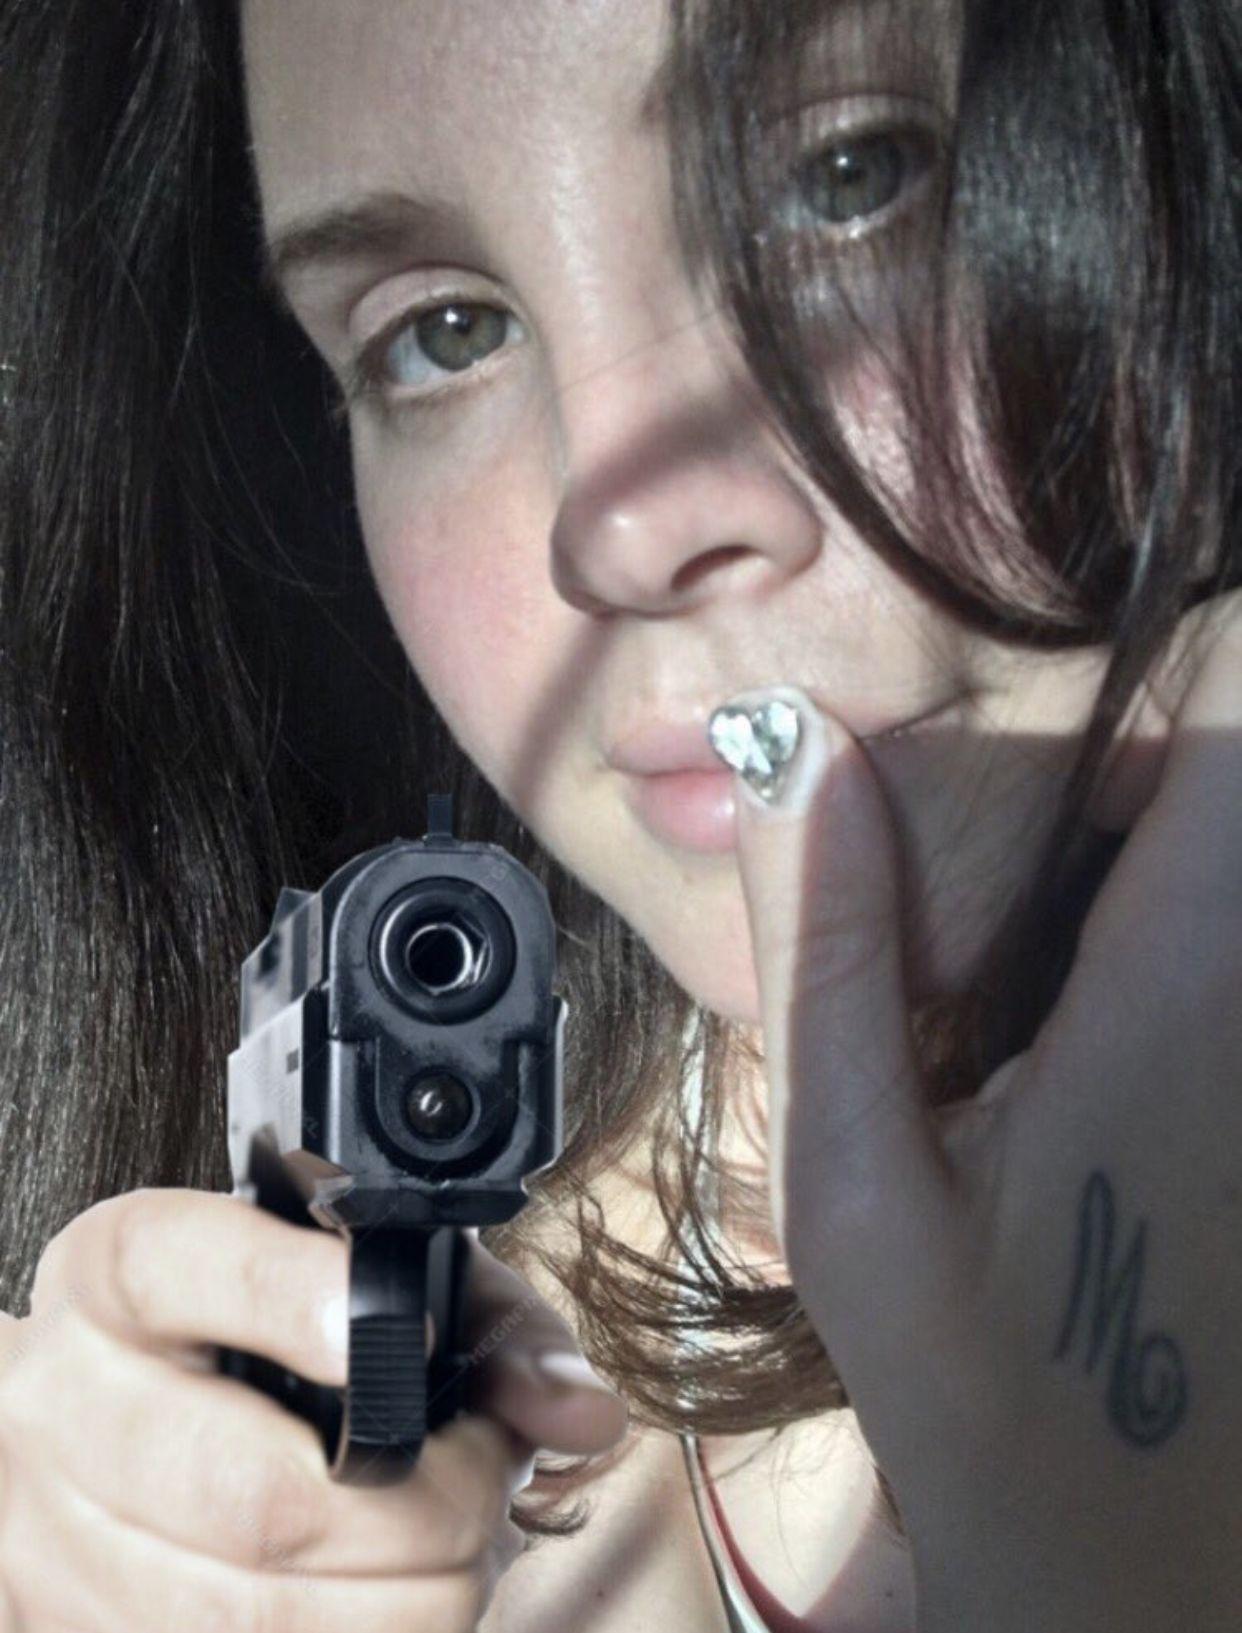 Pin By Zirve On Other Lana Del Rey Art Lana Del Rey Memes Lana Del Rey